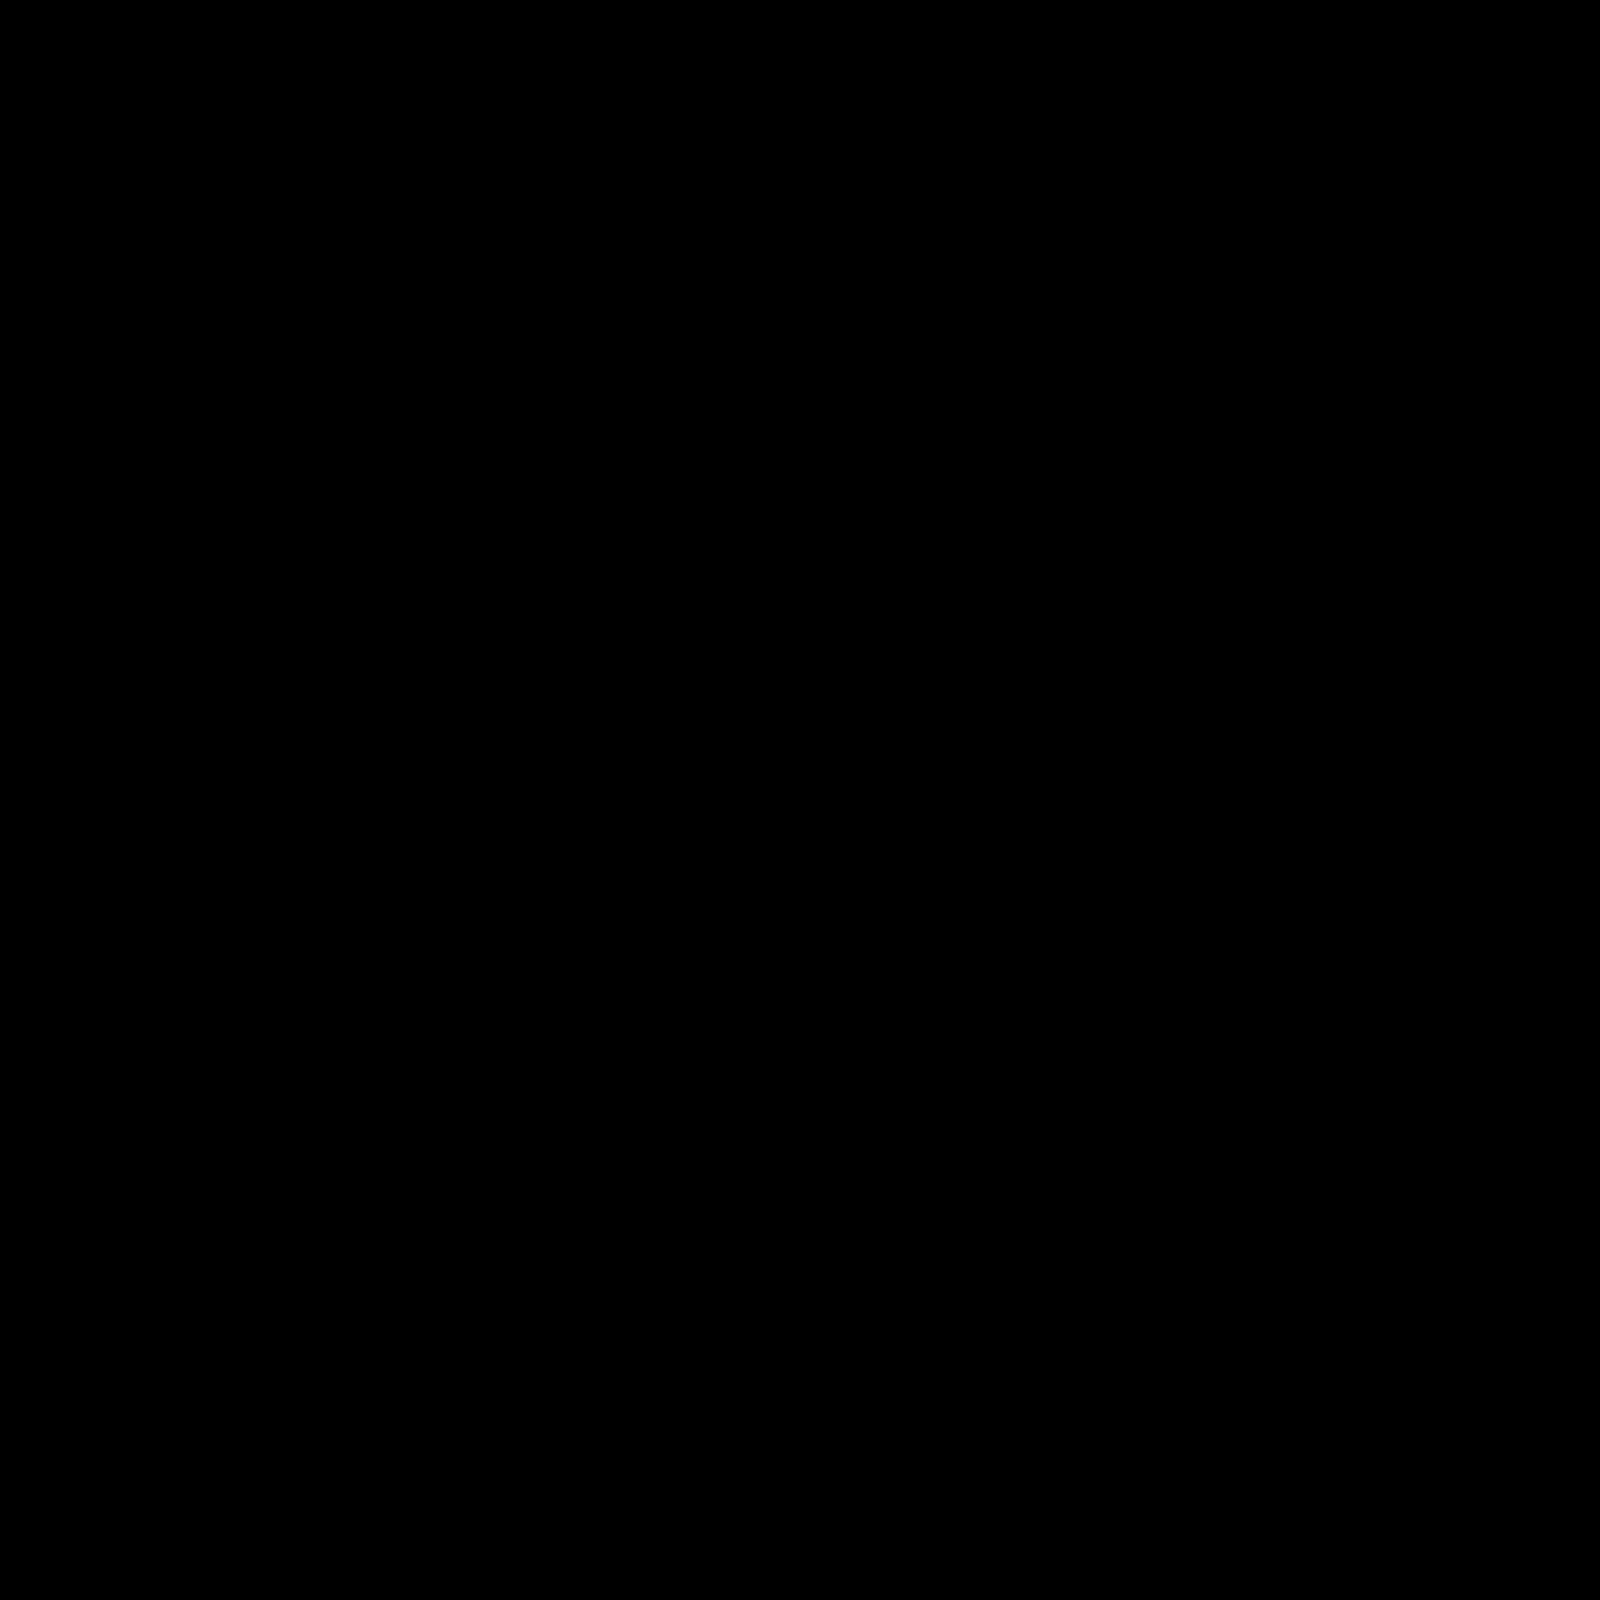 Klappe icon